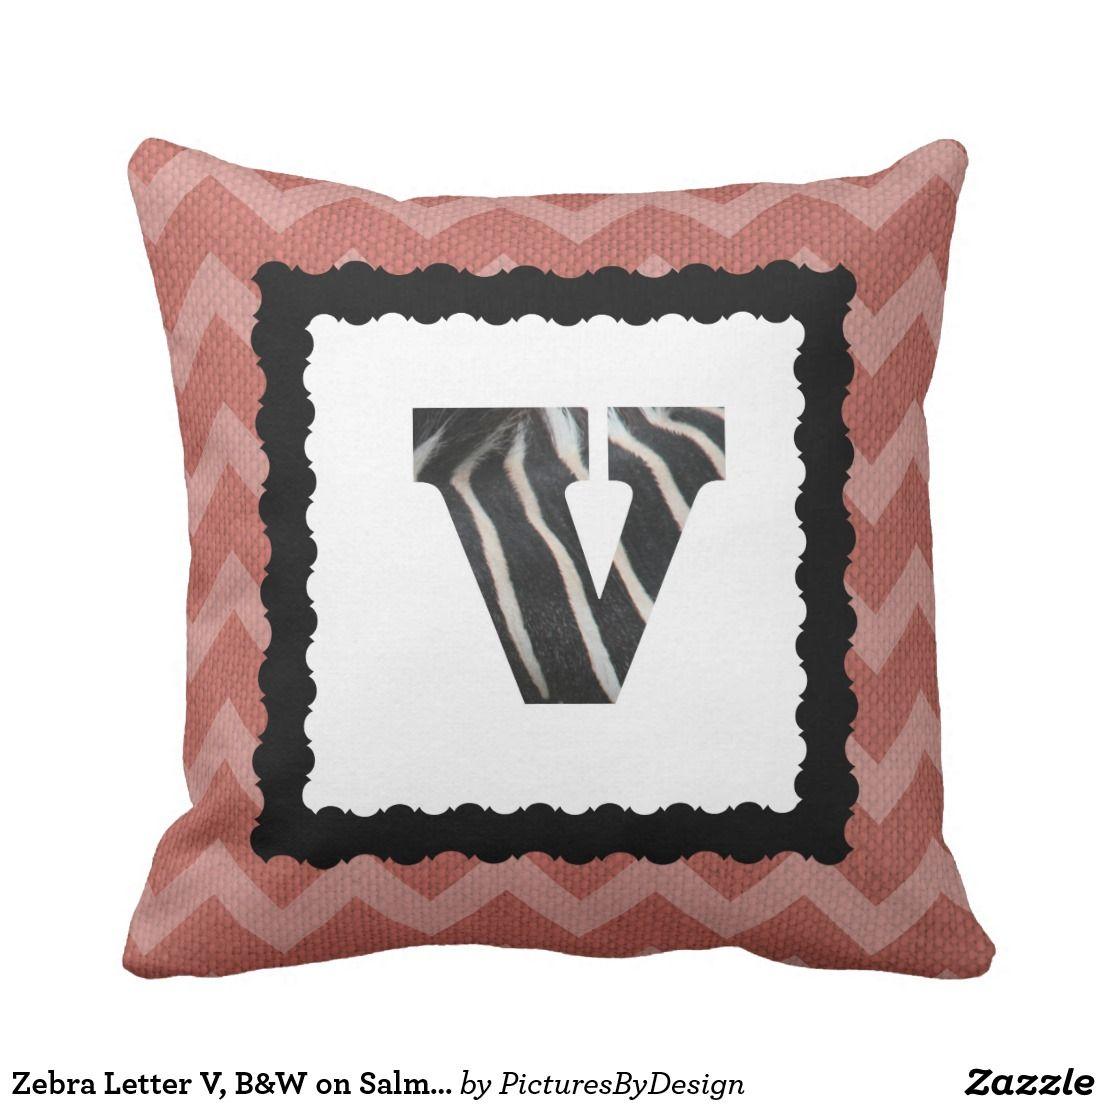 Zebra letter v buw on salmonwhite chevron throw pillow hands off